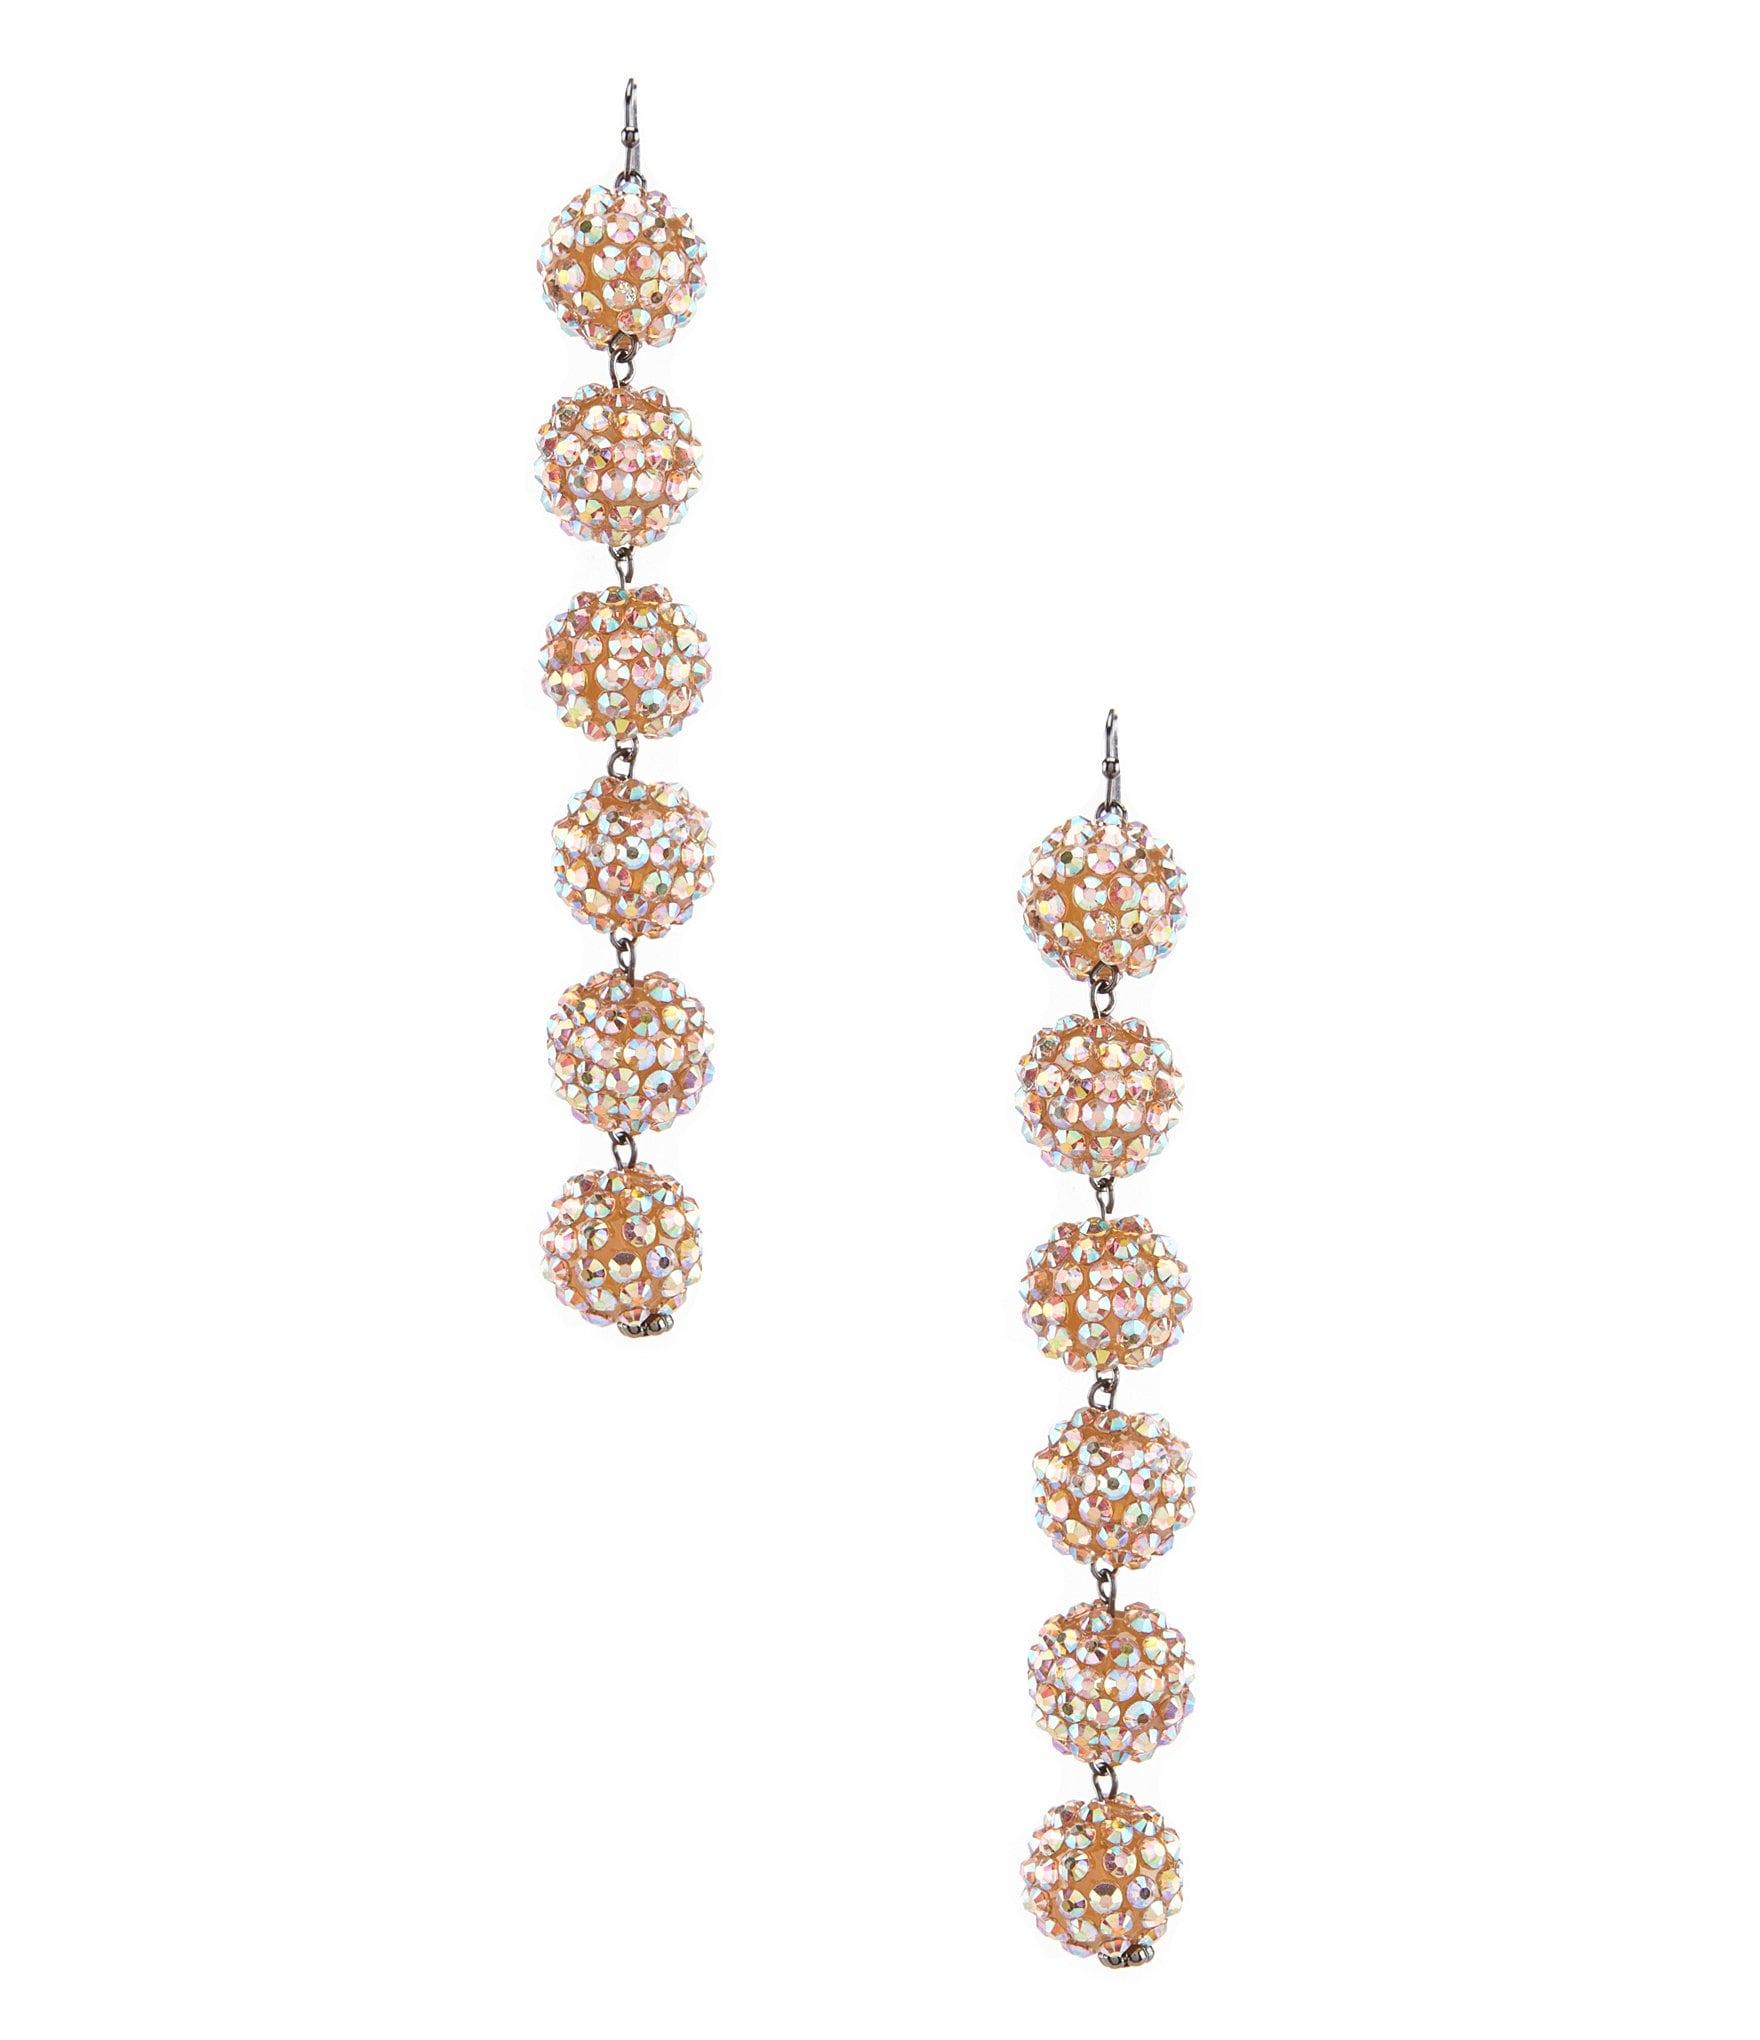 Accessories Jewelry Bridal Jewelry Earrings